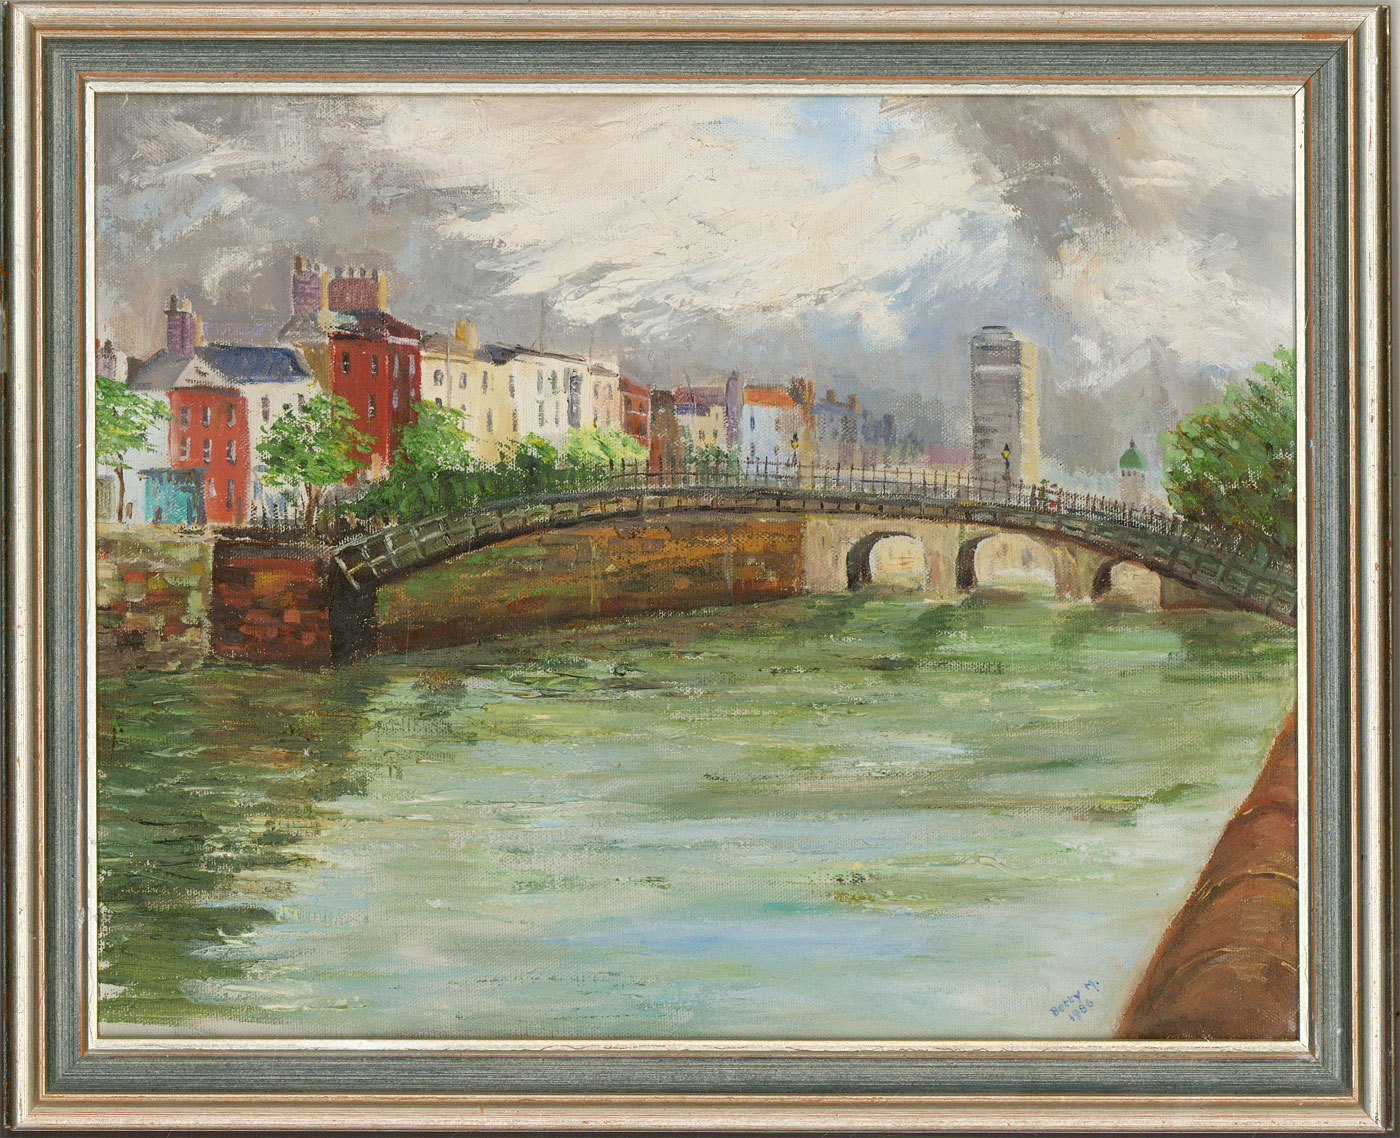 Berty M. - Signed & Framed 1986 Acrylic, River Liffey Bridge